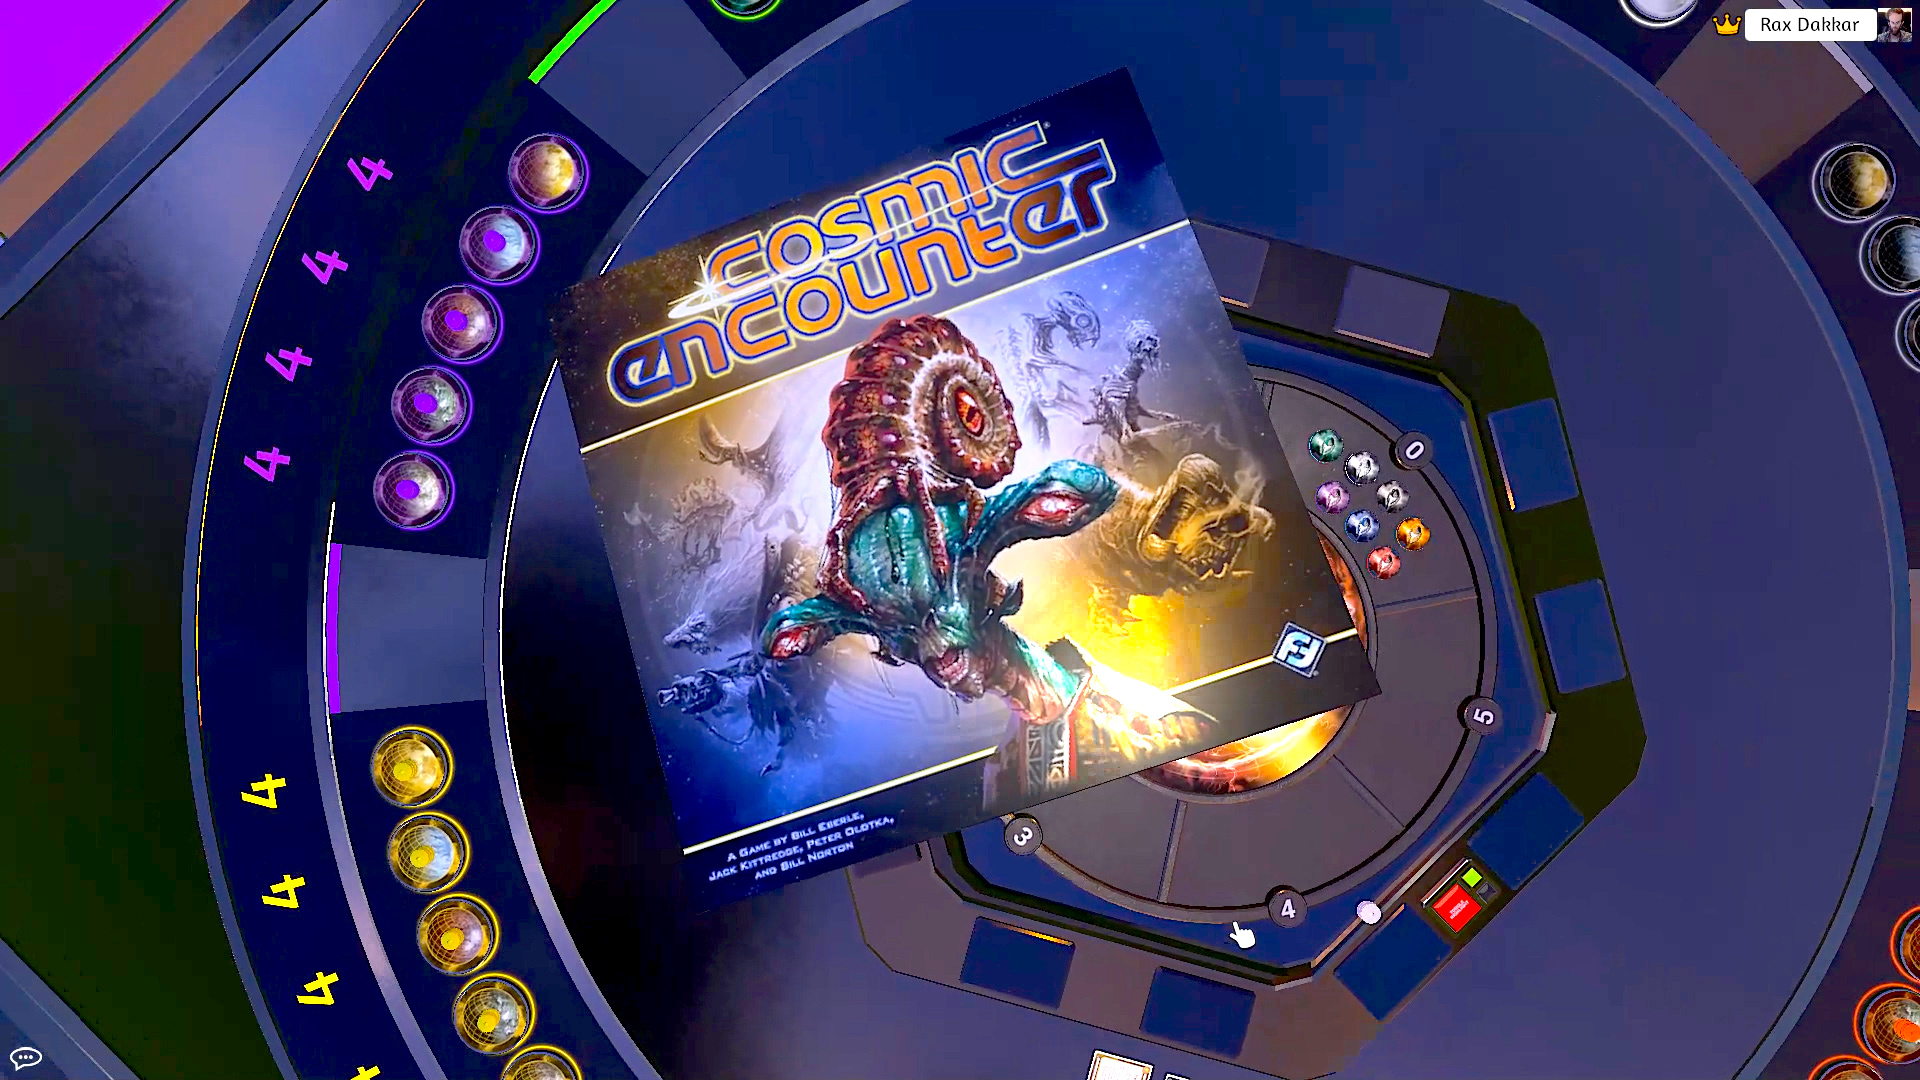 A virtual Cosmic Encounter board game box